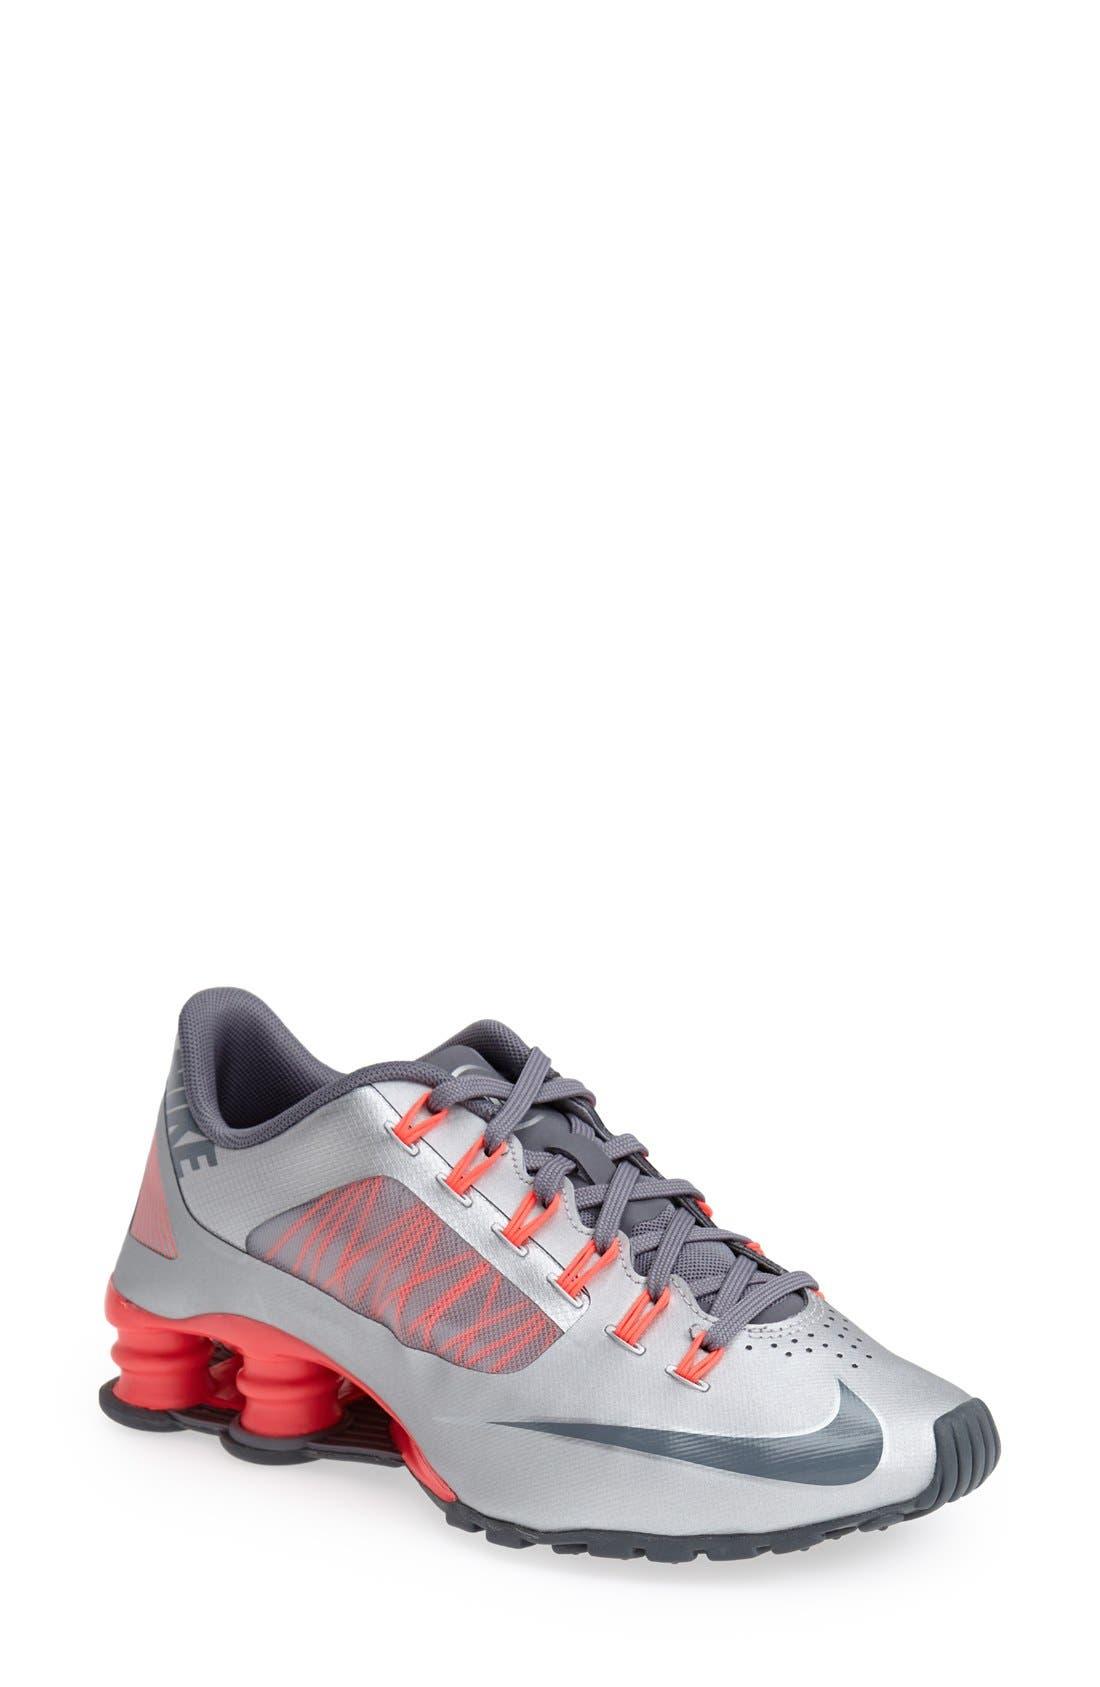 'Shox Superfly R4' Running Shoe,                             Main thumbnail 1, color,                             020